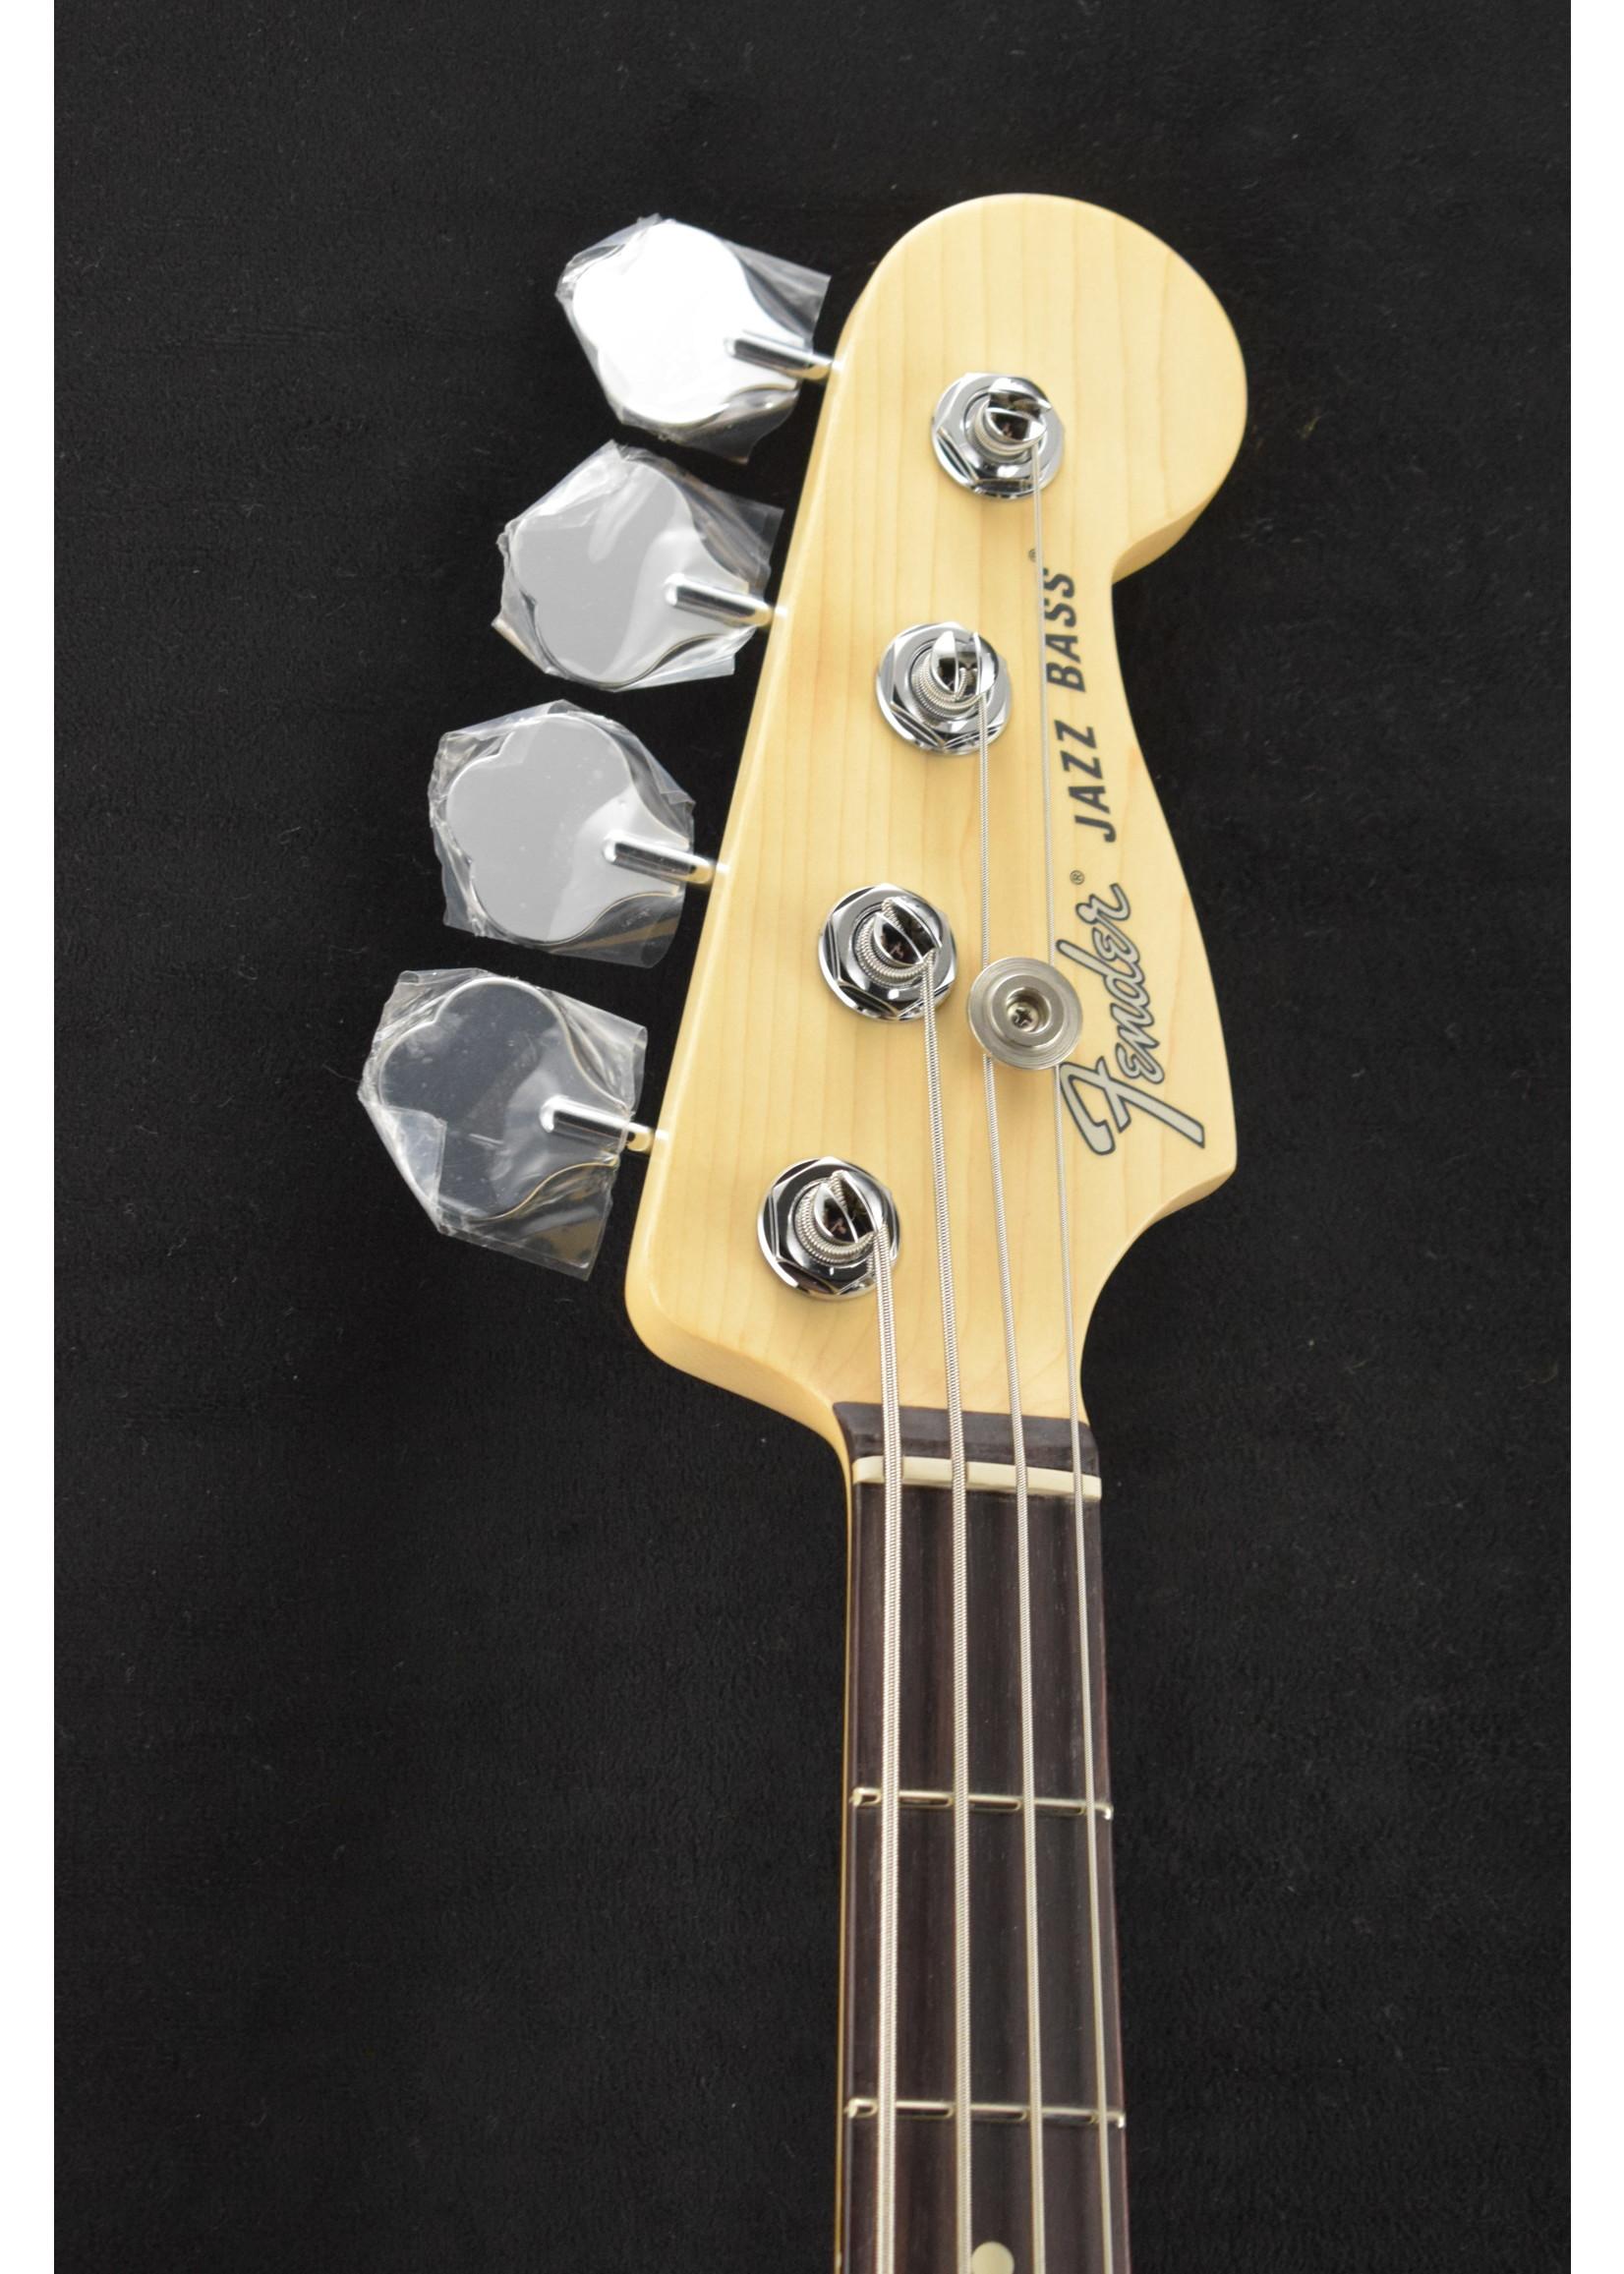 Fender Fender American Performer Jazz Bass Rosewood Fretboard 3-Tone Sunburst